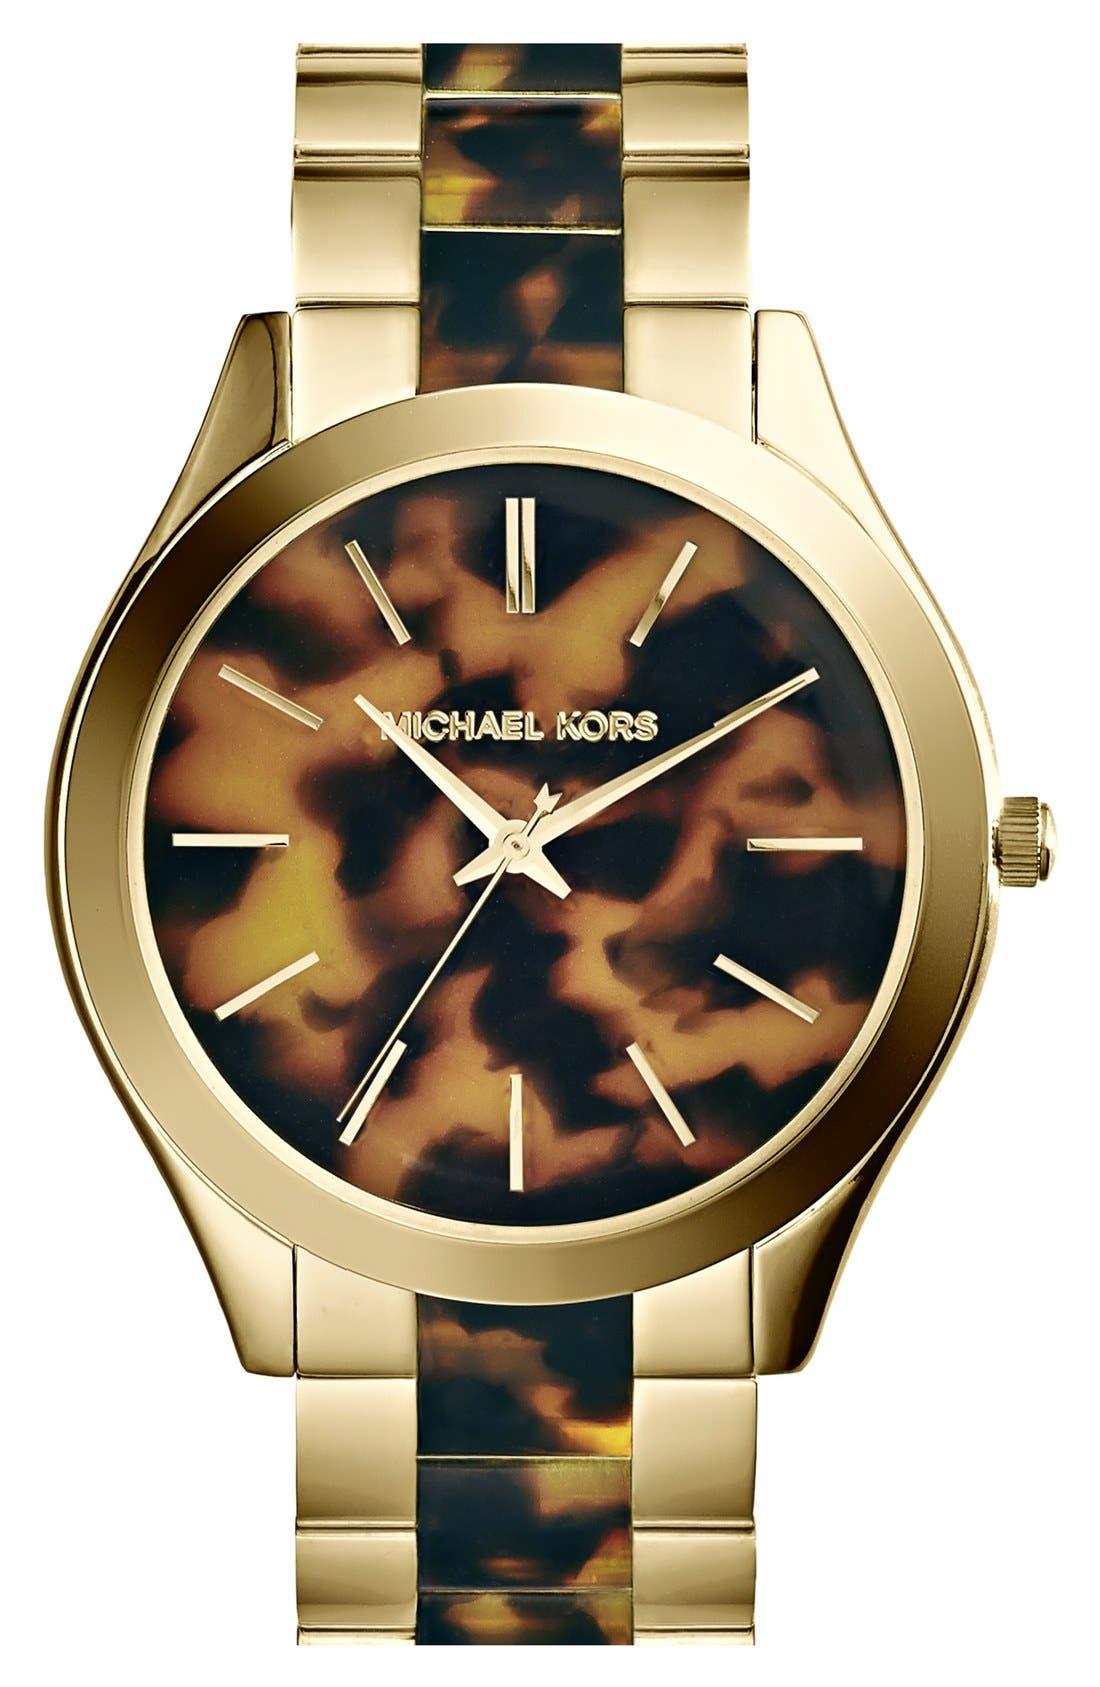 Michael Kors 'Slim Runway' Round Bracelet Watch, 42mm,                             Main thumbnail 1, color,                             Tortoise/ Gold